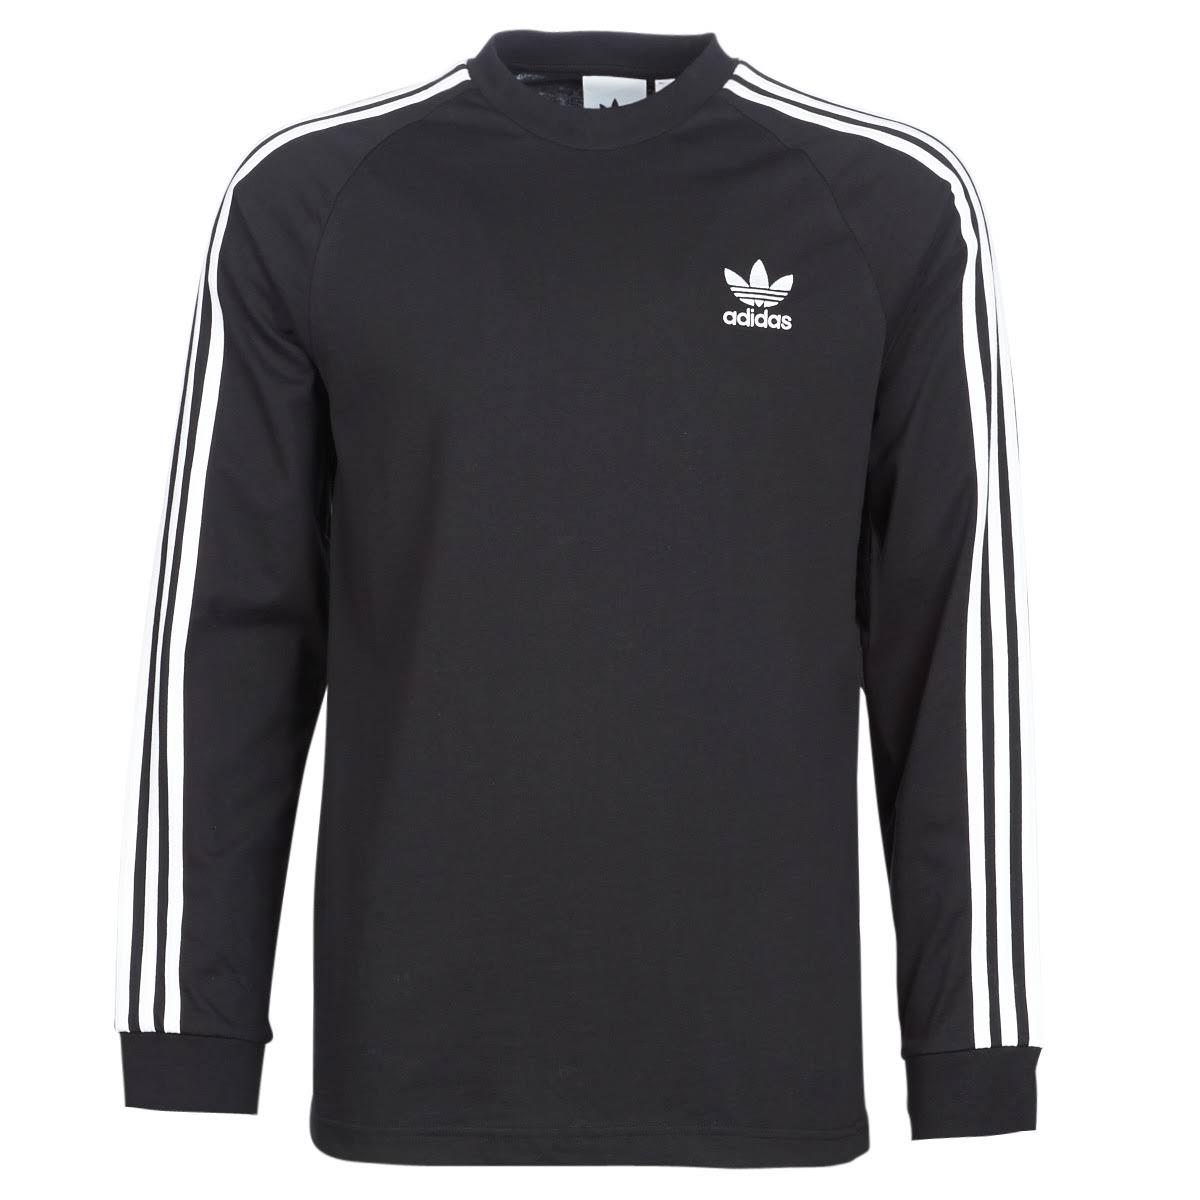 Svart strisce Svart strisce Adidas3 T T Ls Adidas3 Adidas3 strisce Ls 35RjA4Lcq